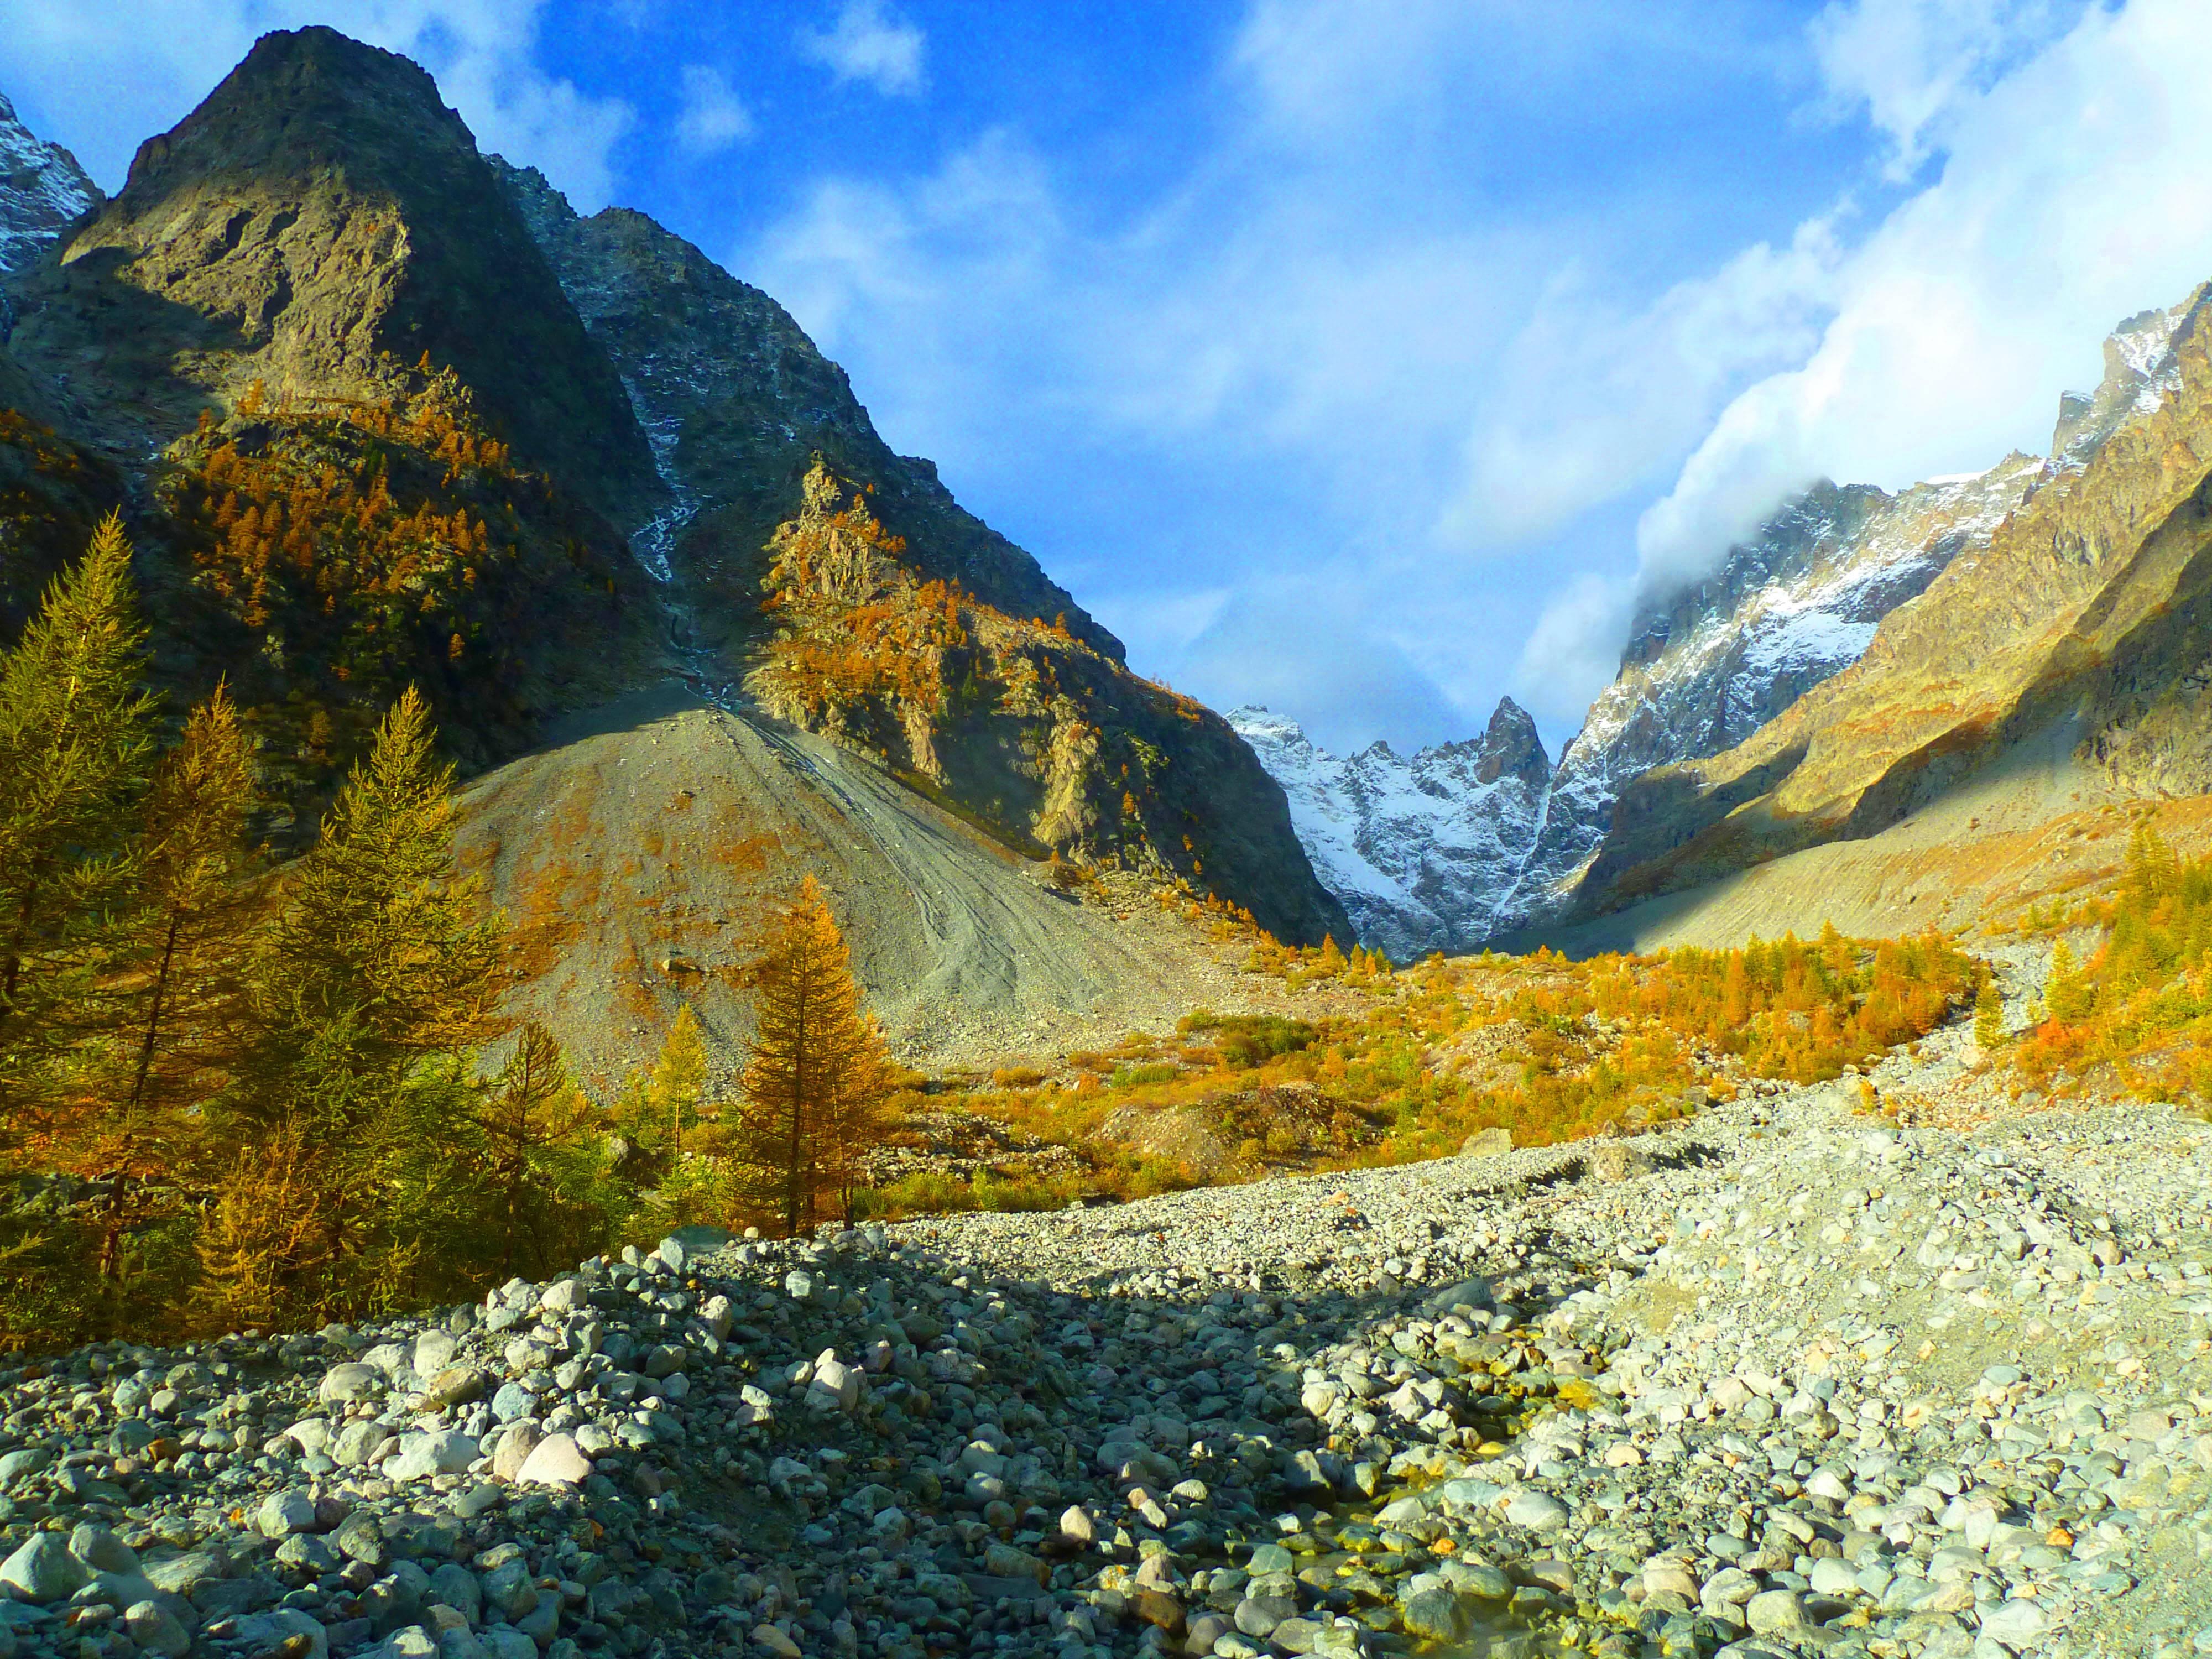 Photo 1: Le refuge du Glacier Blanc